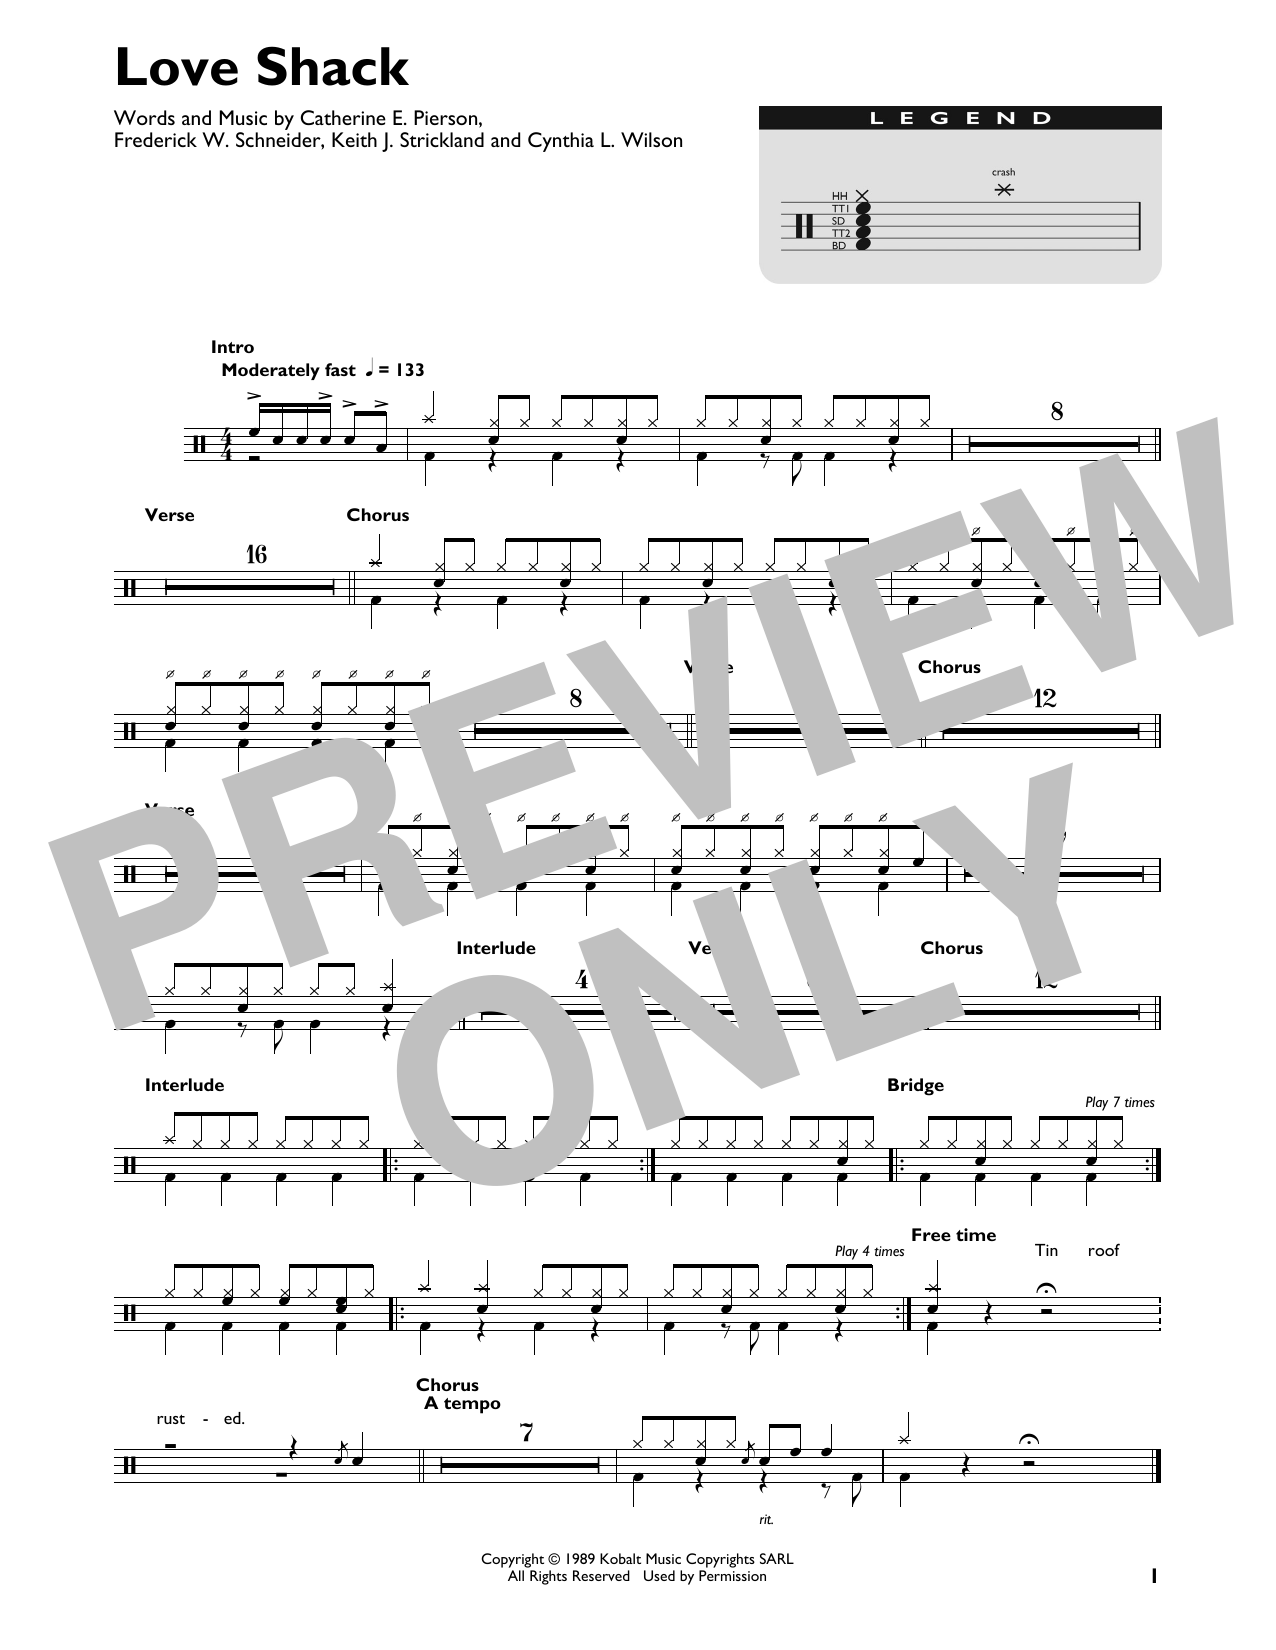 Love Shack (Drums Transcription)